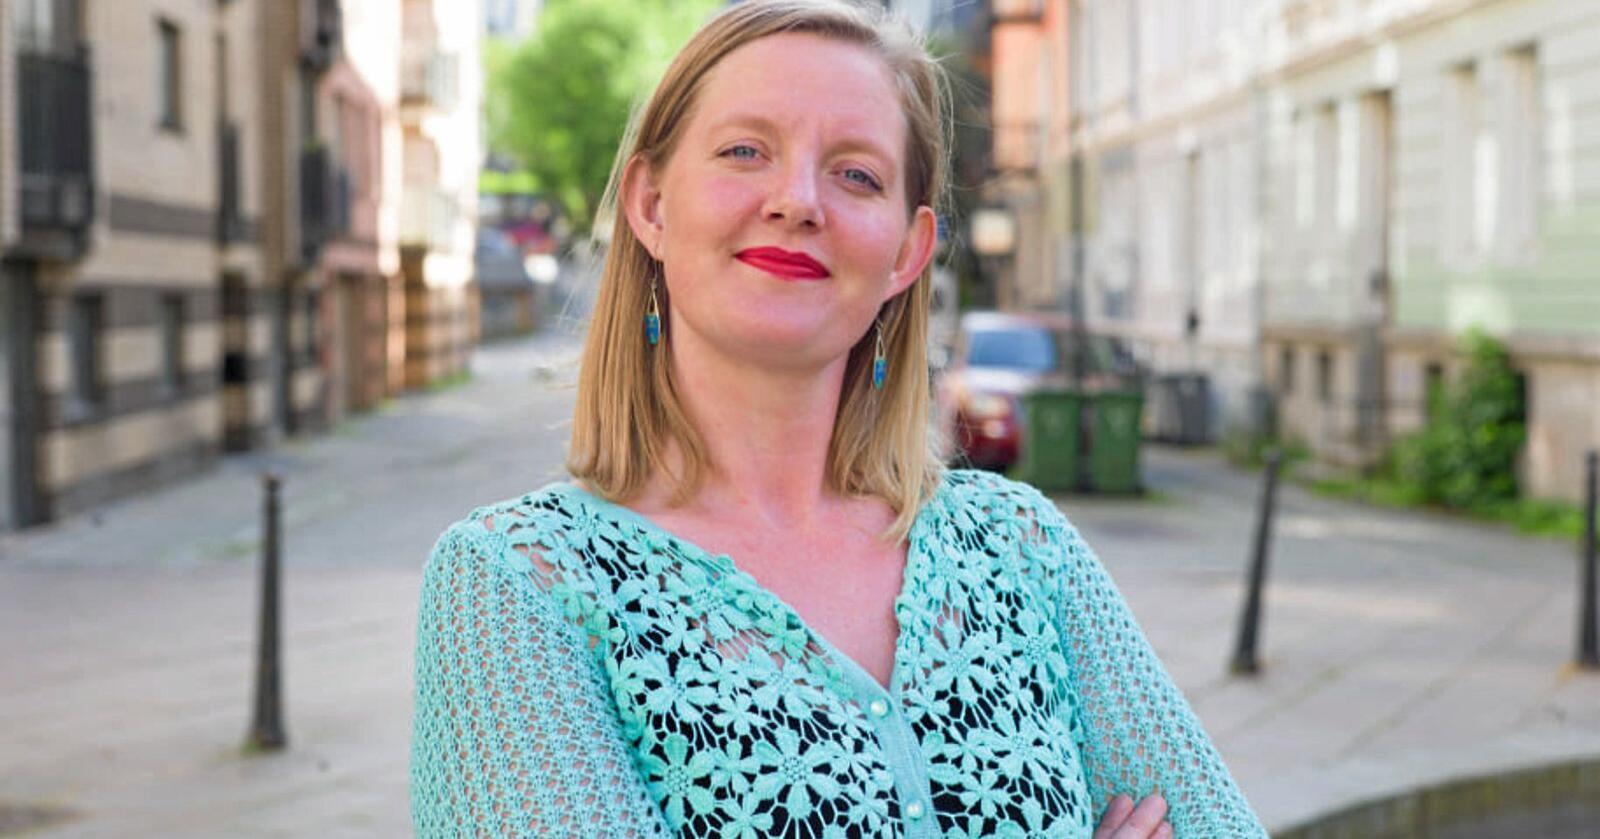 Jeanette O. Syversen, gruppeleiar Raudt i Vestland fylkesting. Foto: Privat